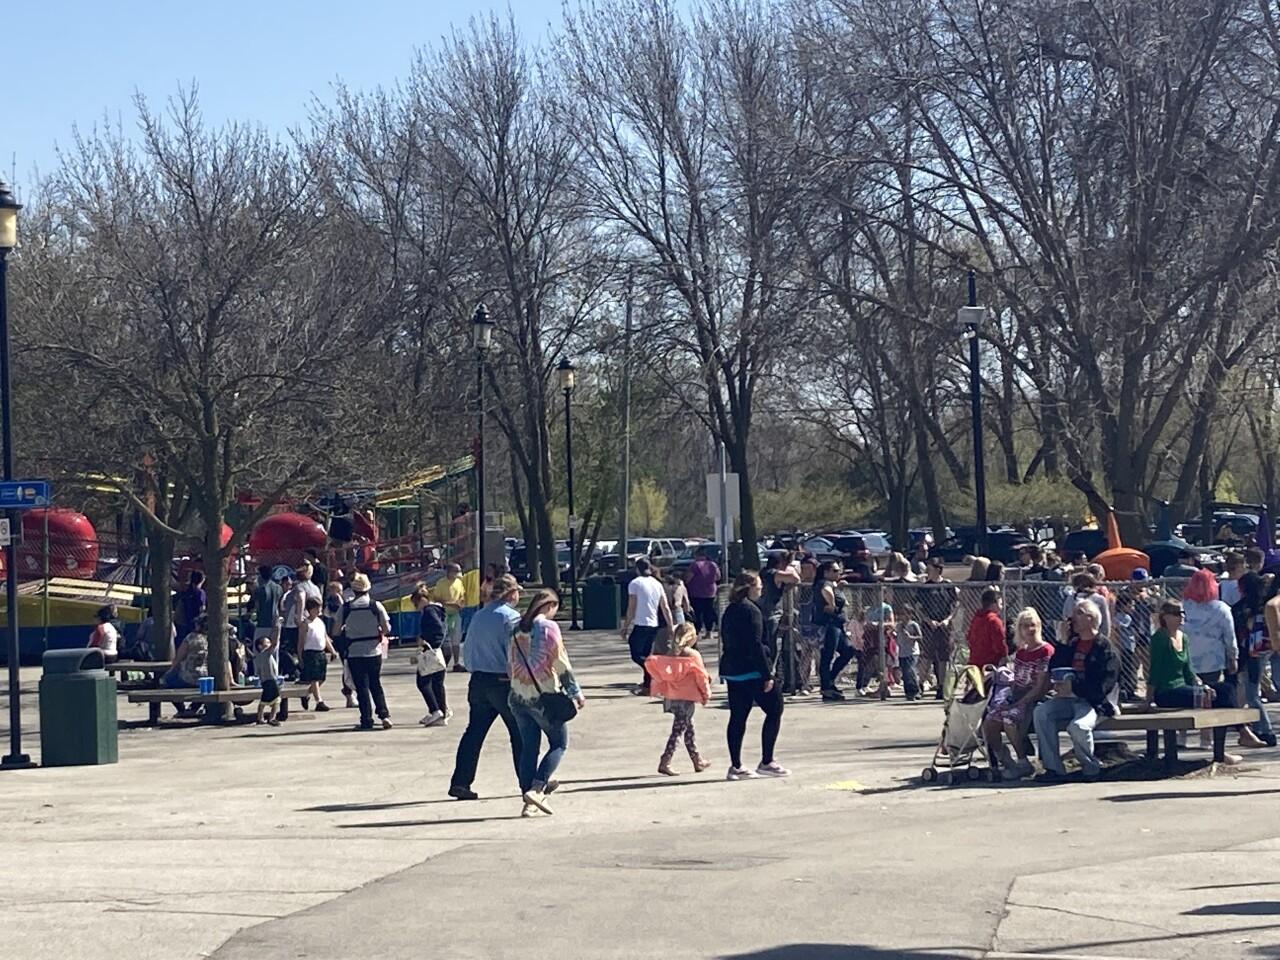 Families come out to Bay Beach Amusement Park